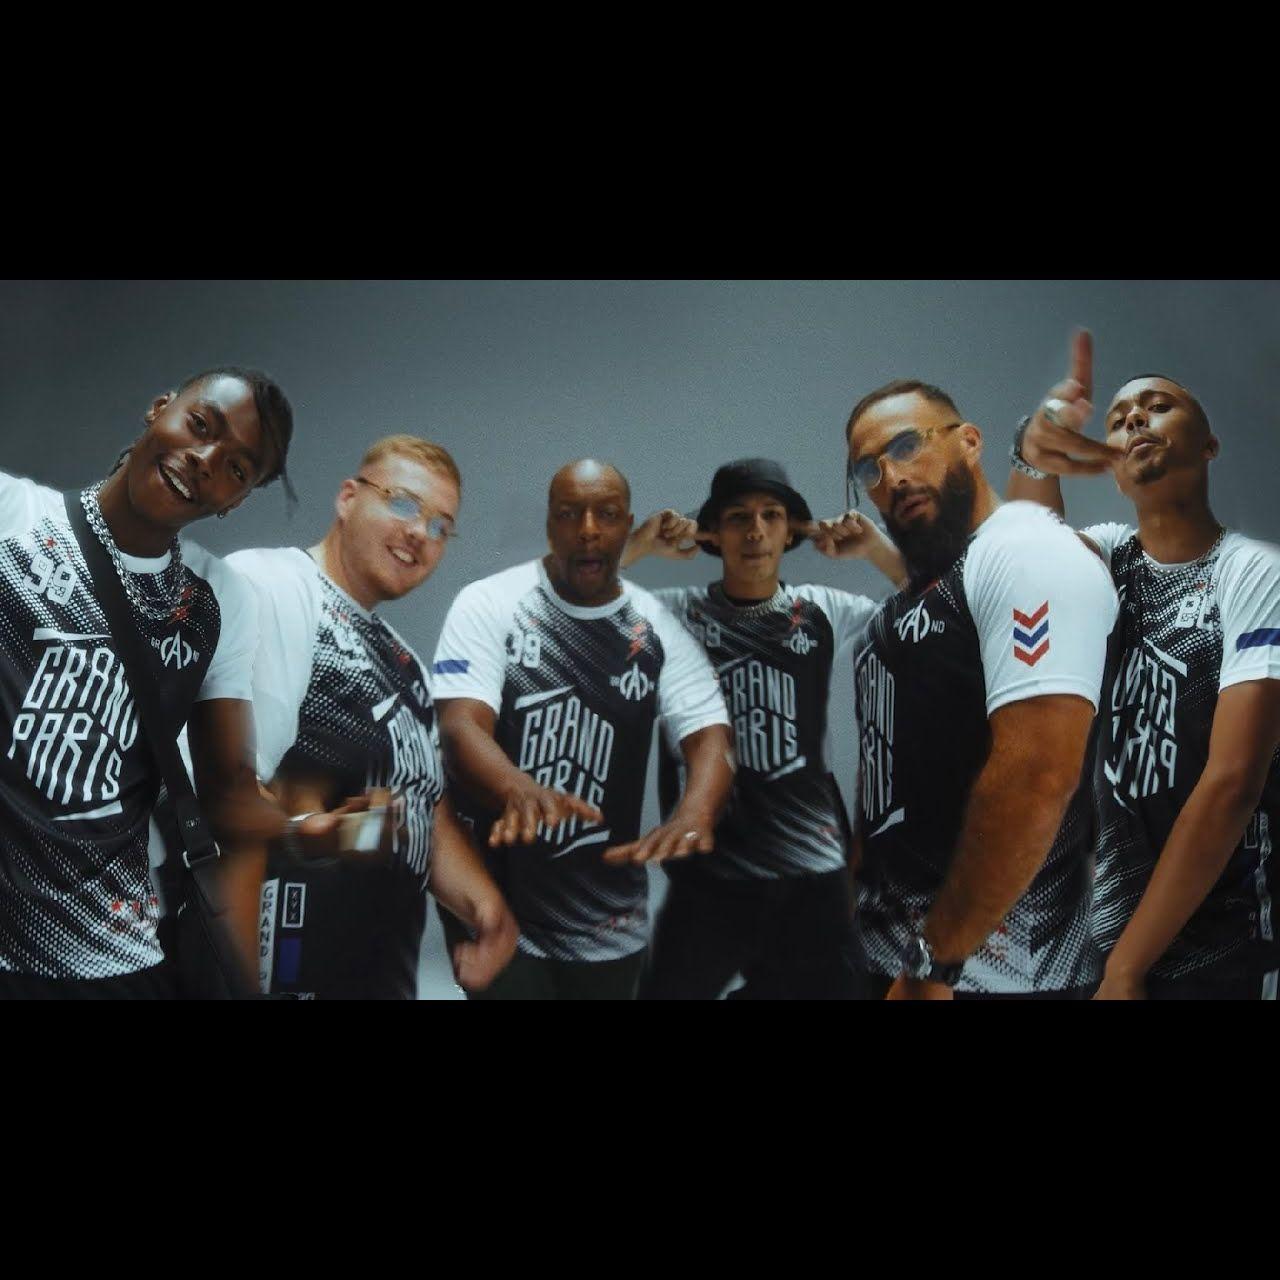 Médine - Grand Paris 2 (ft. Koba LaD, Larry, Pirate, Rémy and Oxmo Puccino) (Thumbnail)